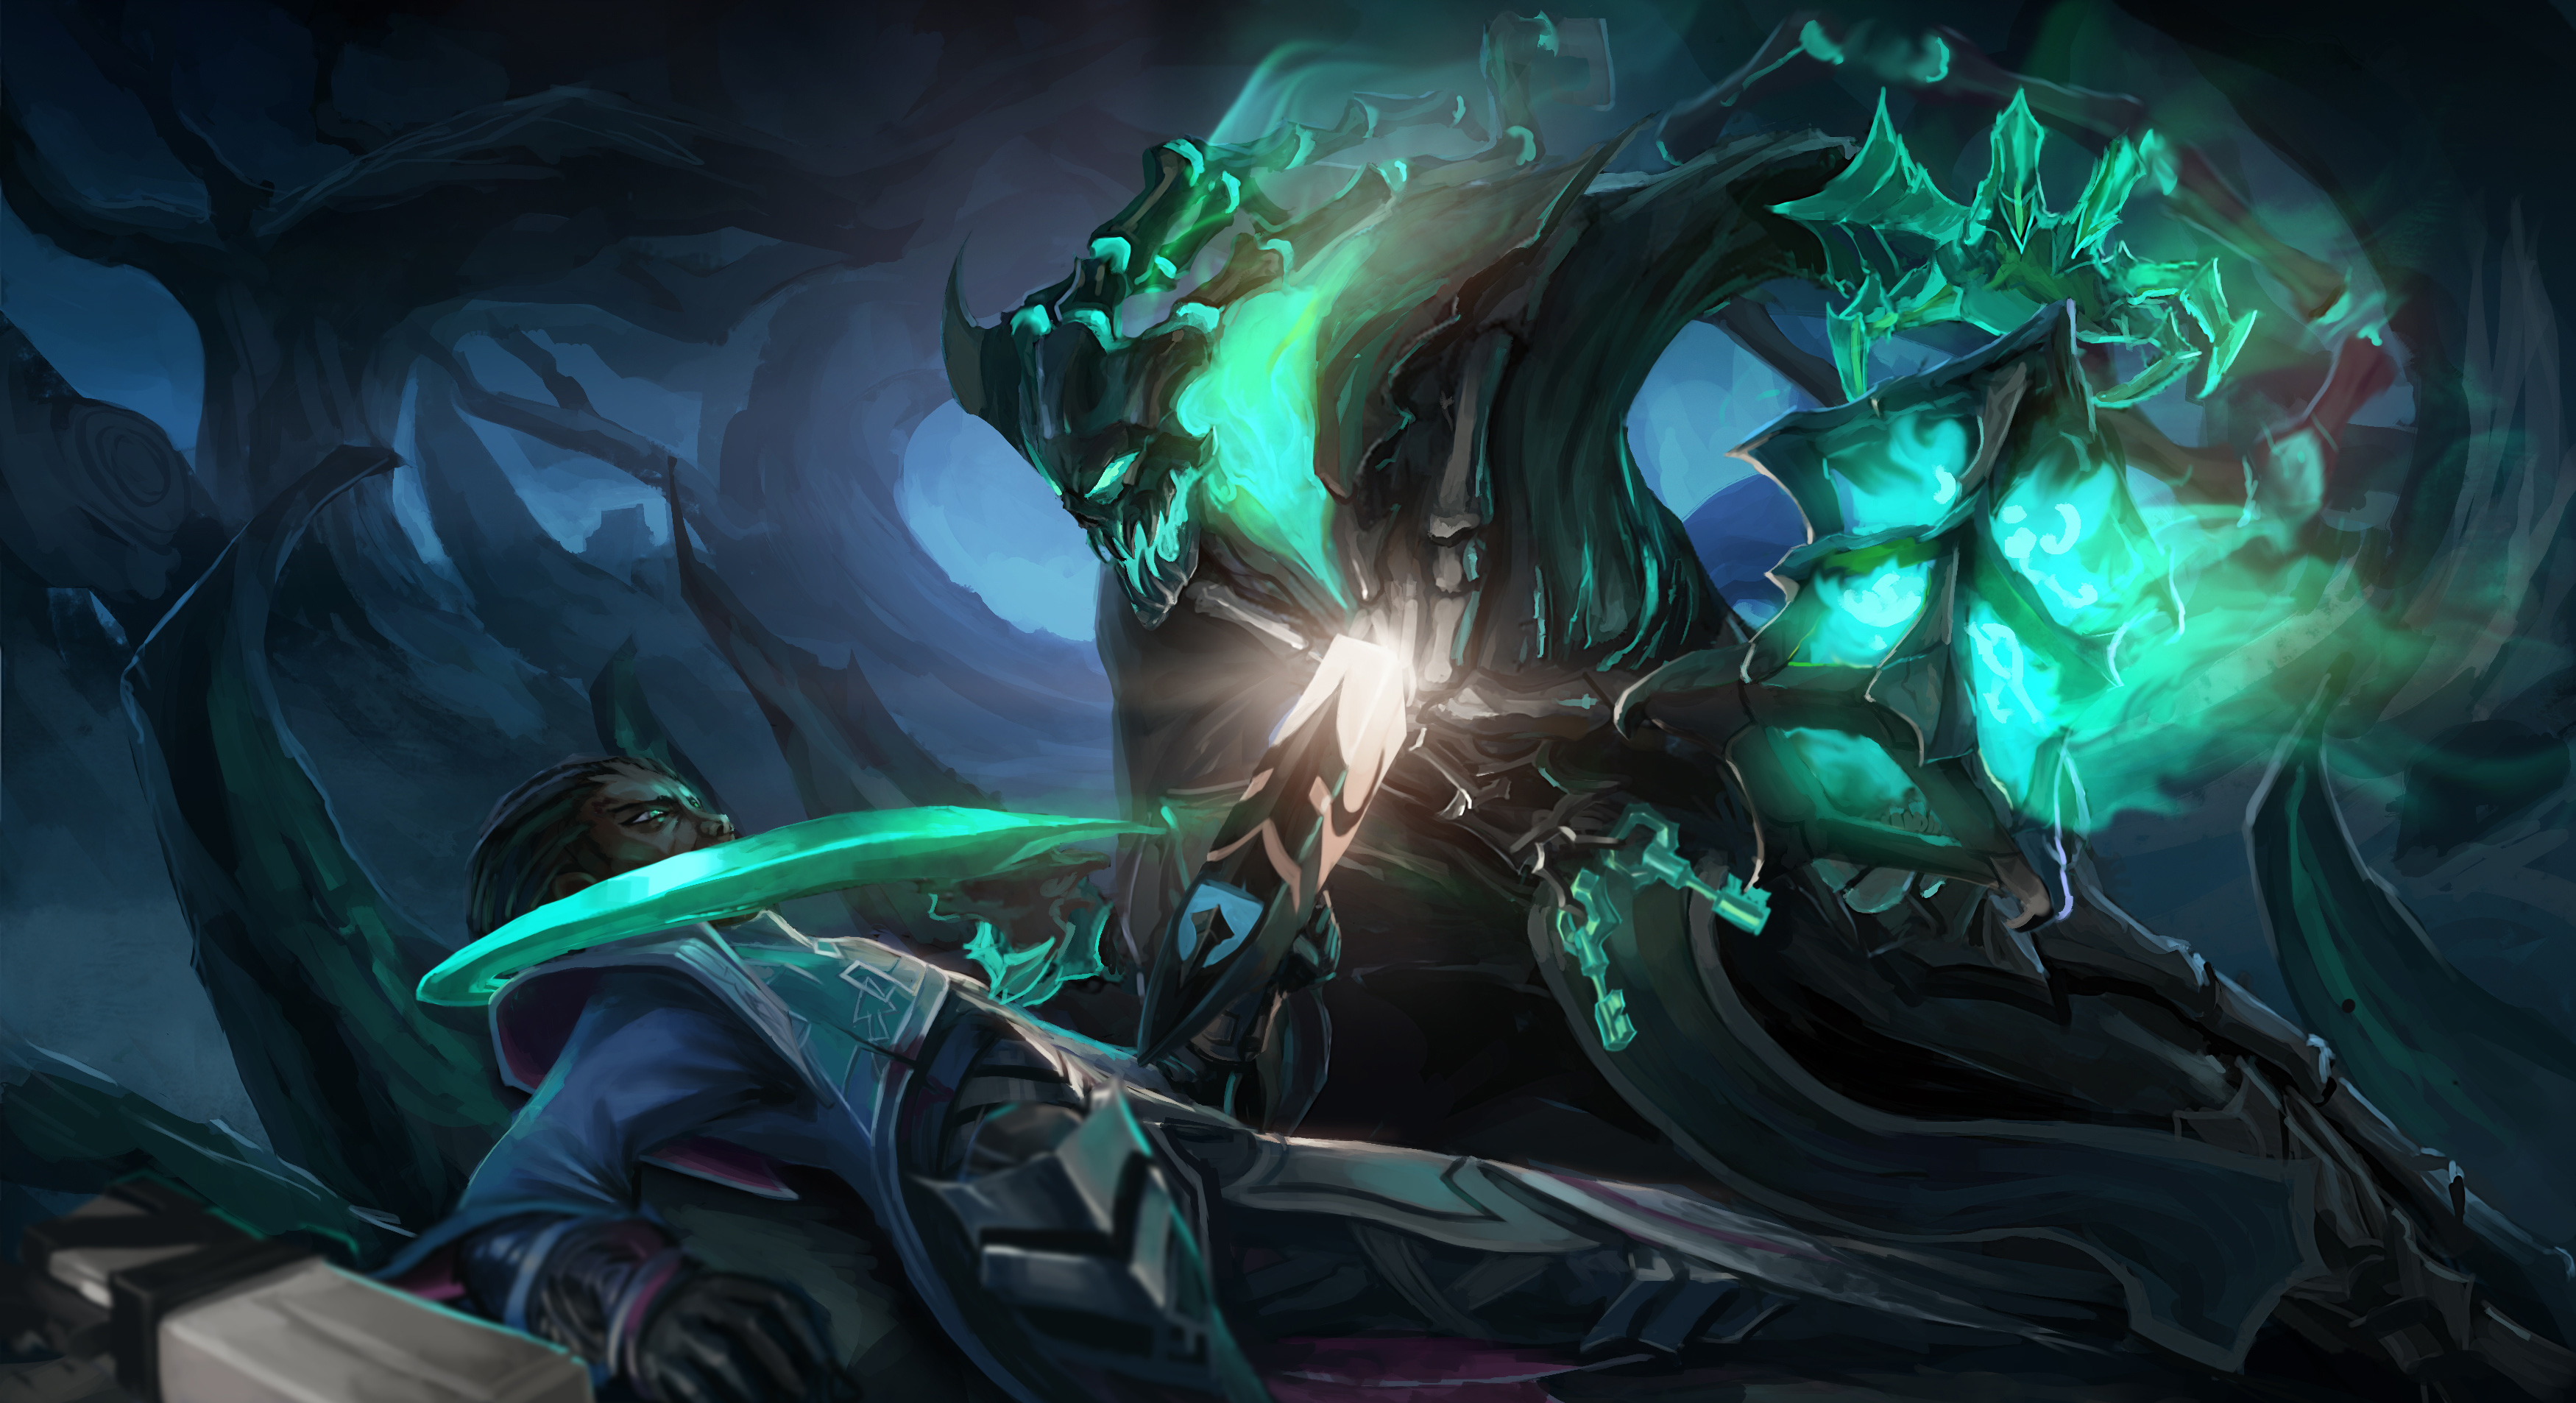 League Of Legends Lucian Images As Wallpaper HD   Sotoak 3500x1906